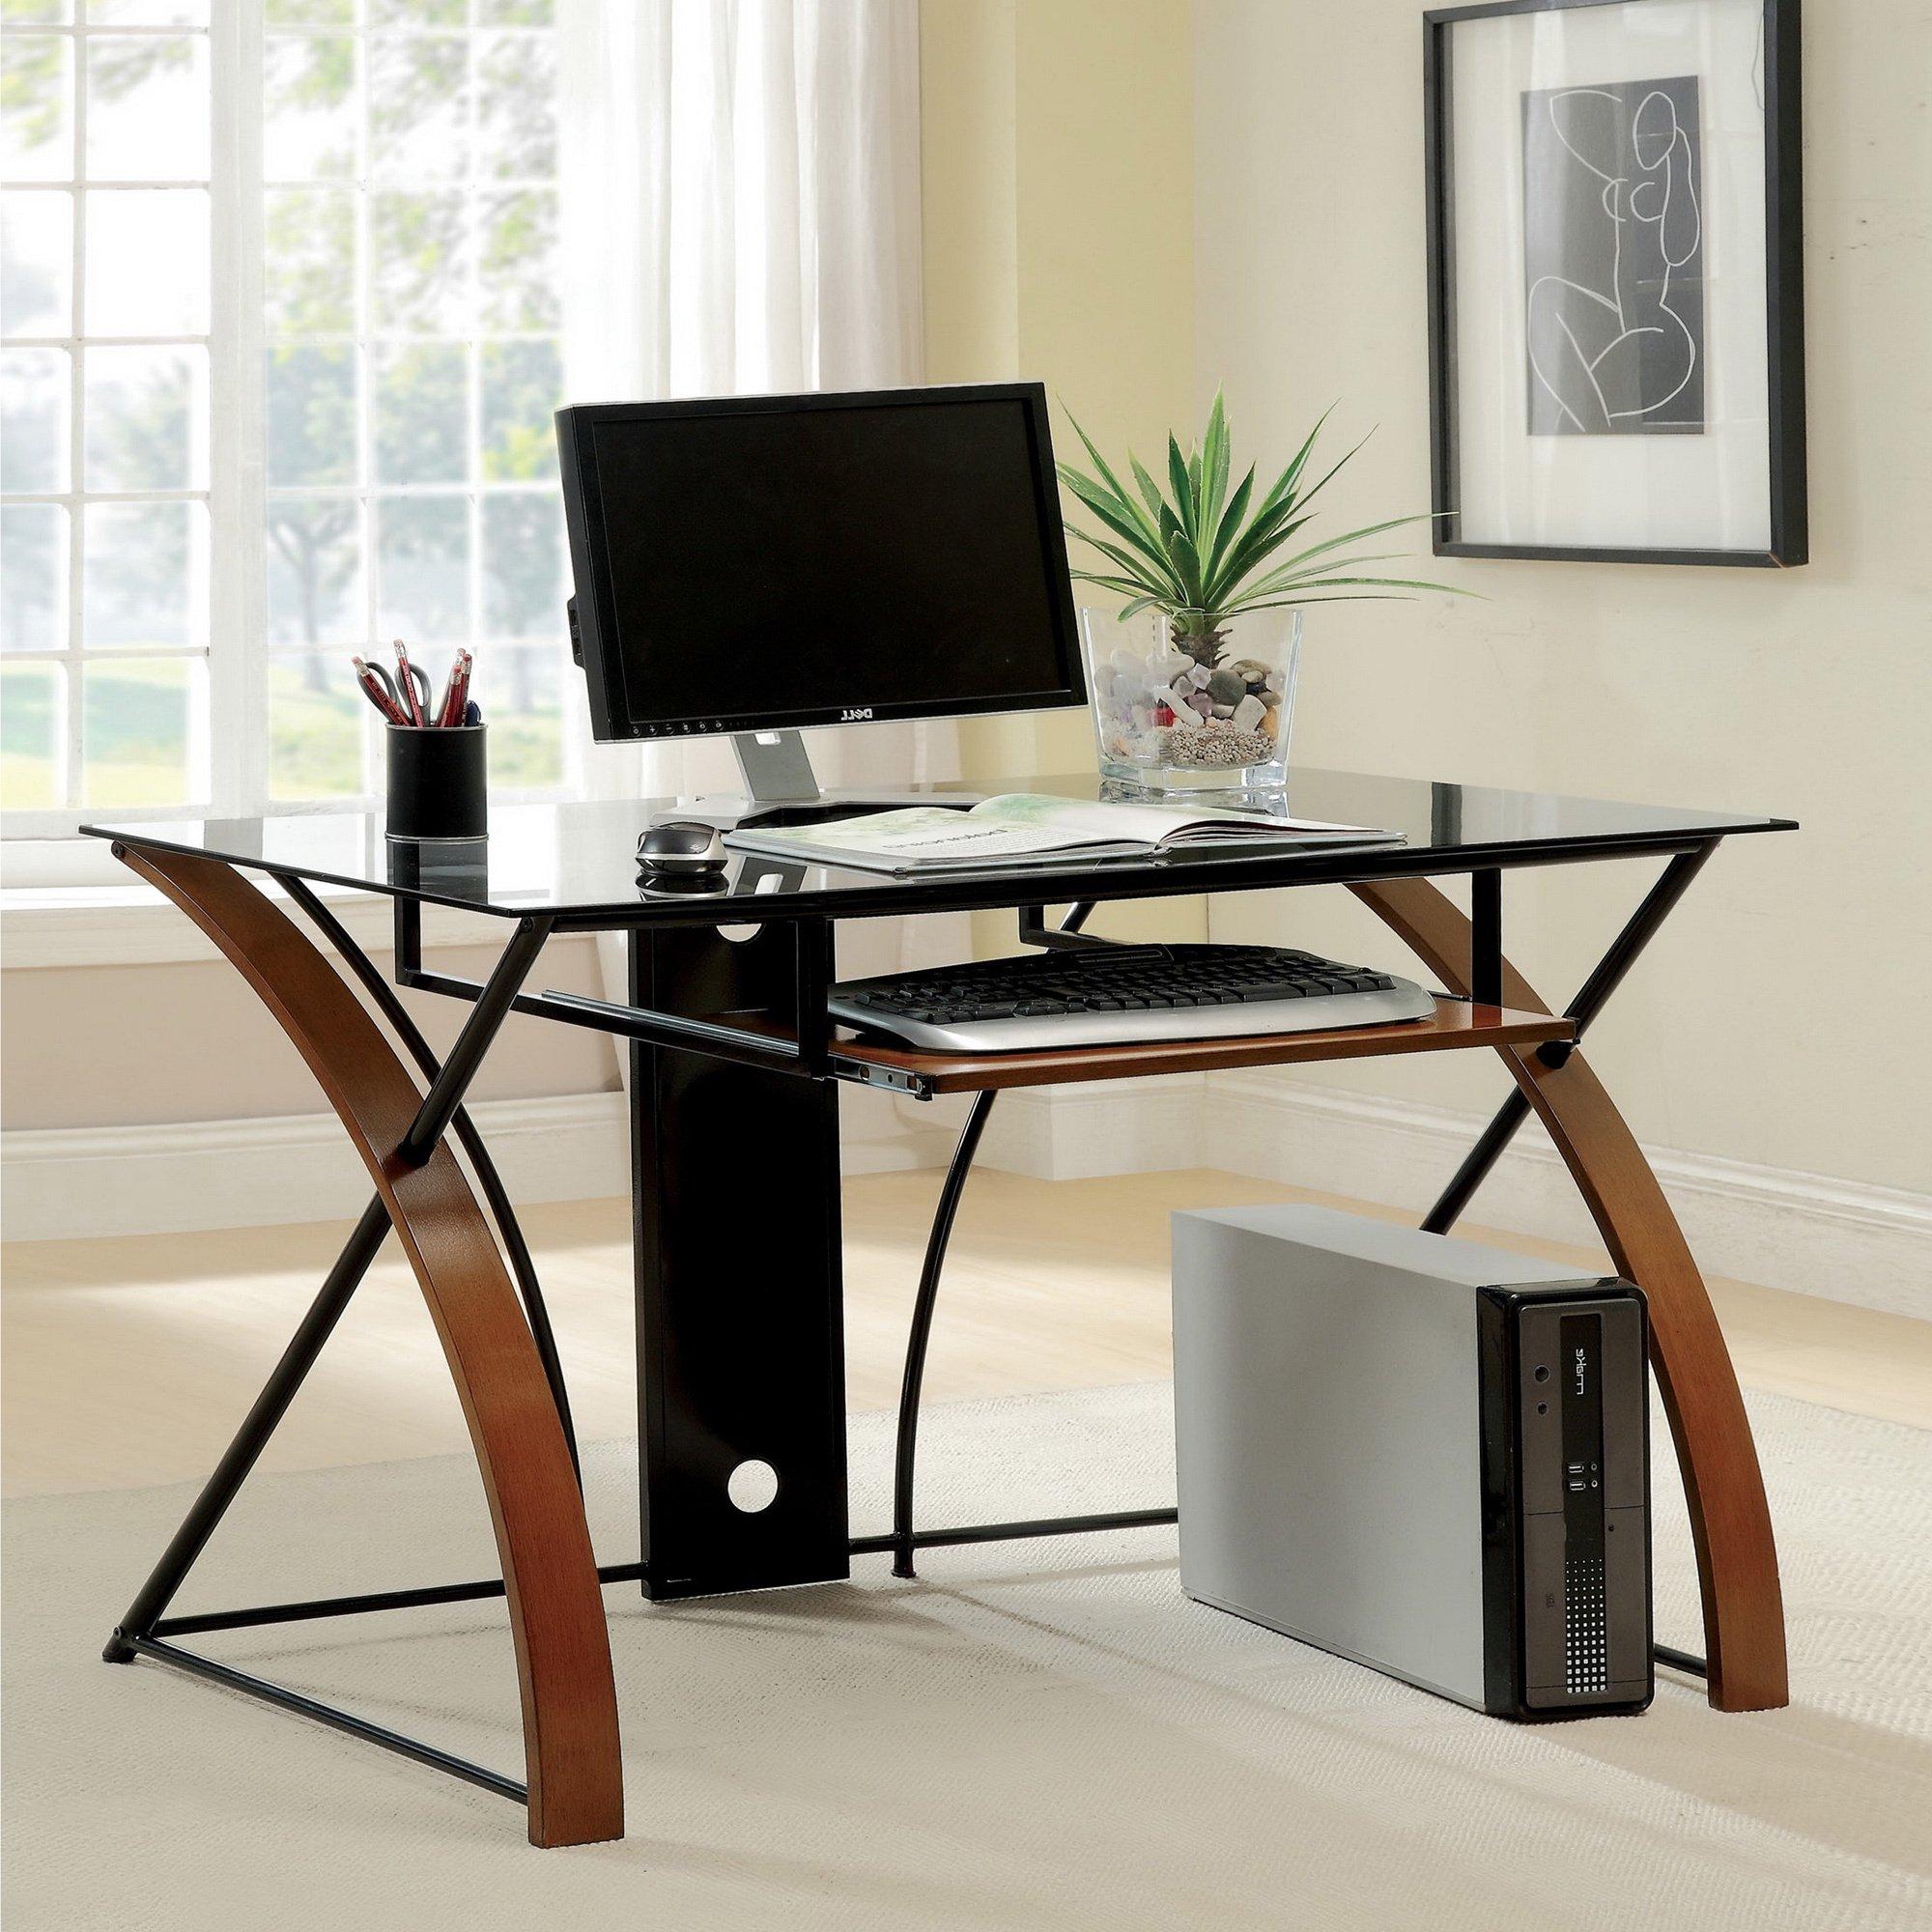 Metro Shop Furniture of America Sirga Modern Grey Tempered Glass Computer Desk-Oak & Black Finish